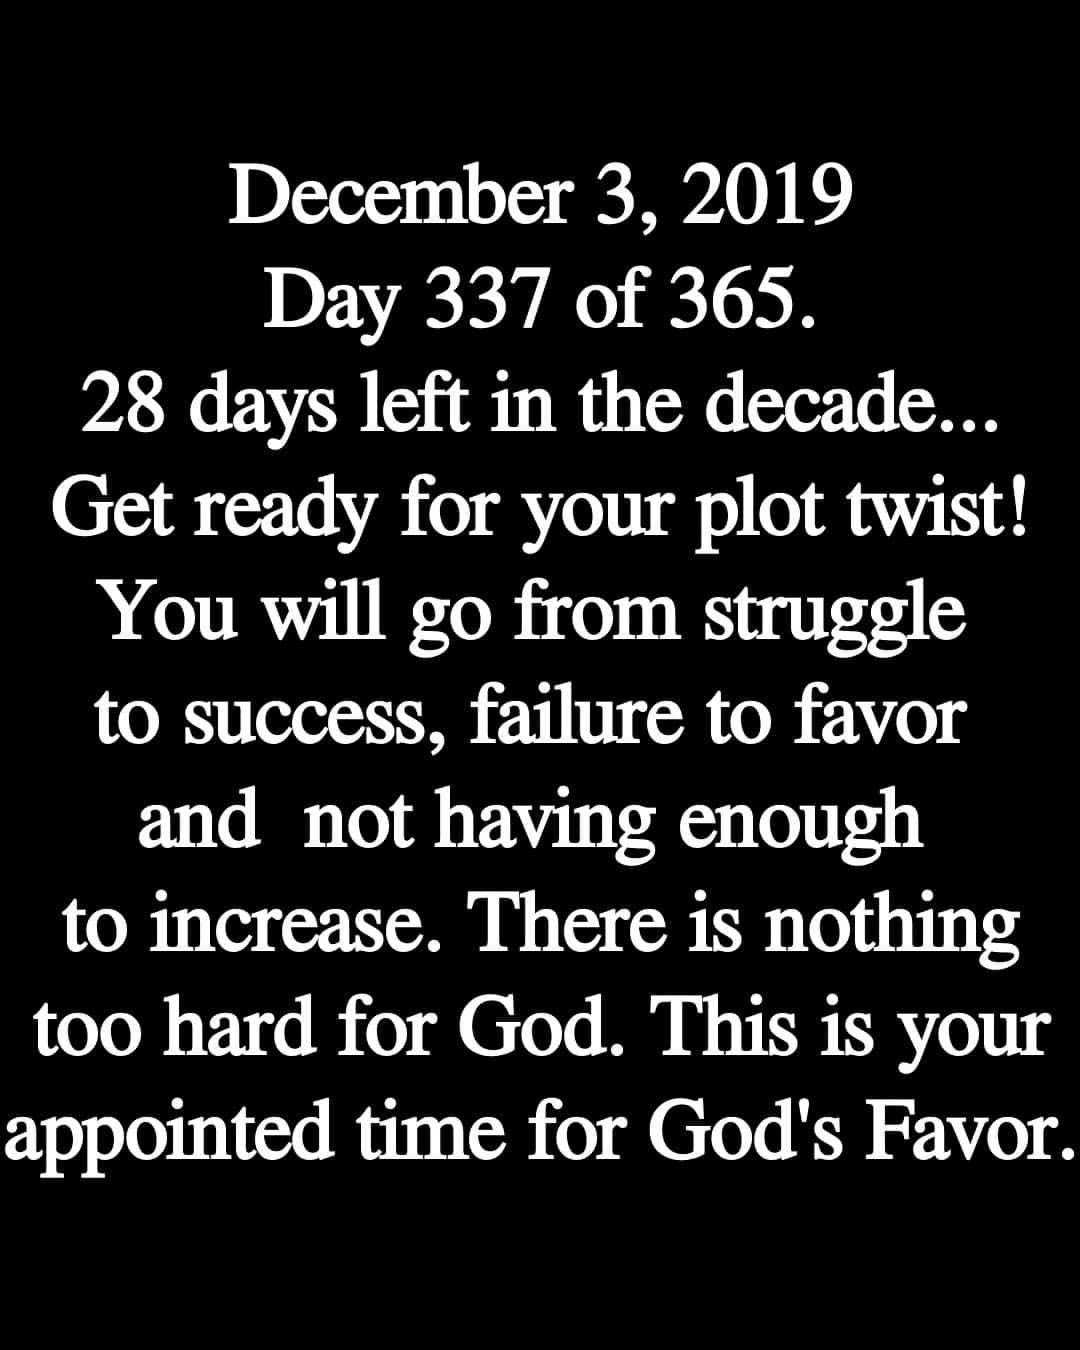 Instagram Photo By Spiritual Inspiration Dec 3 2019 At 5 41 Am